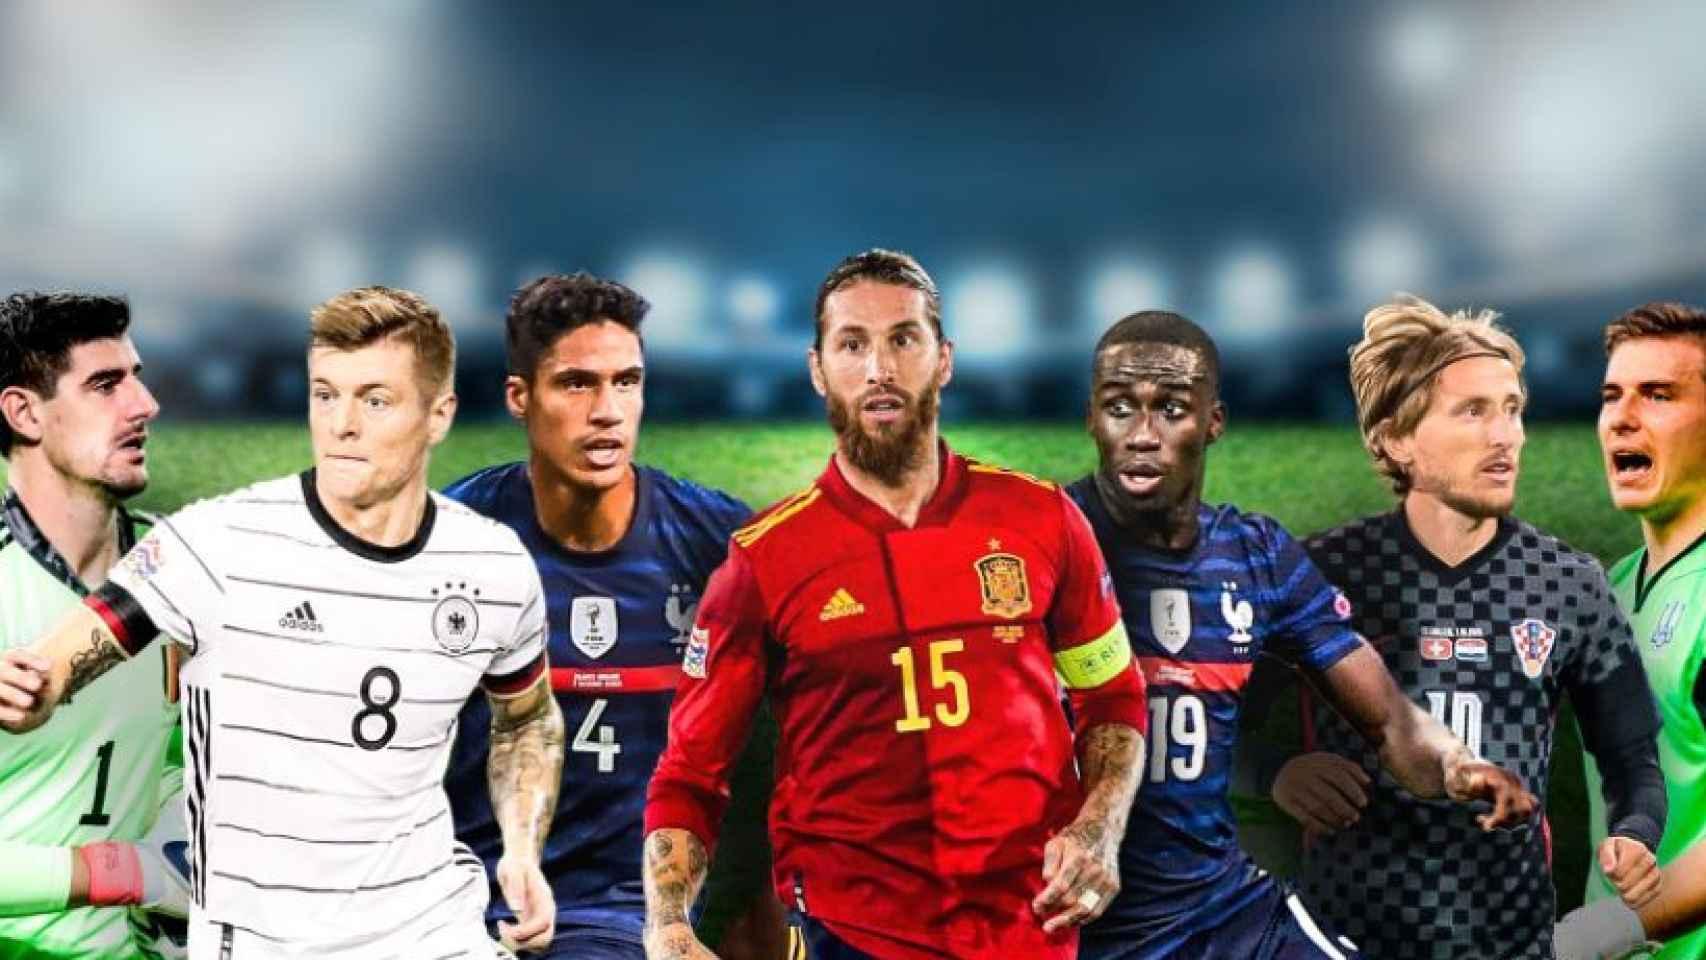 Courtois, Kroos, Varane, Sergio Ramos, Ferland Mendy, Modric y Lunin